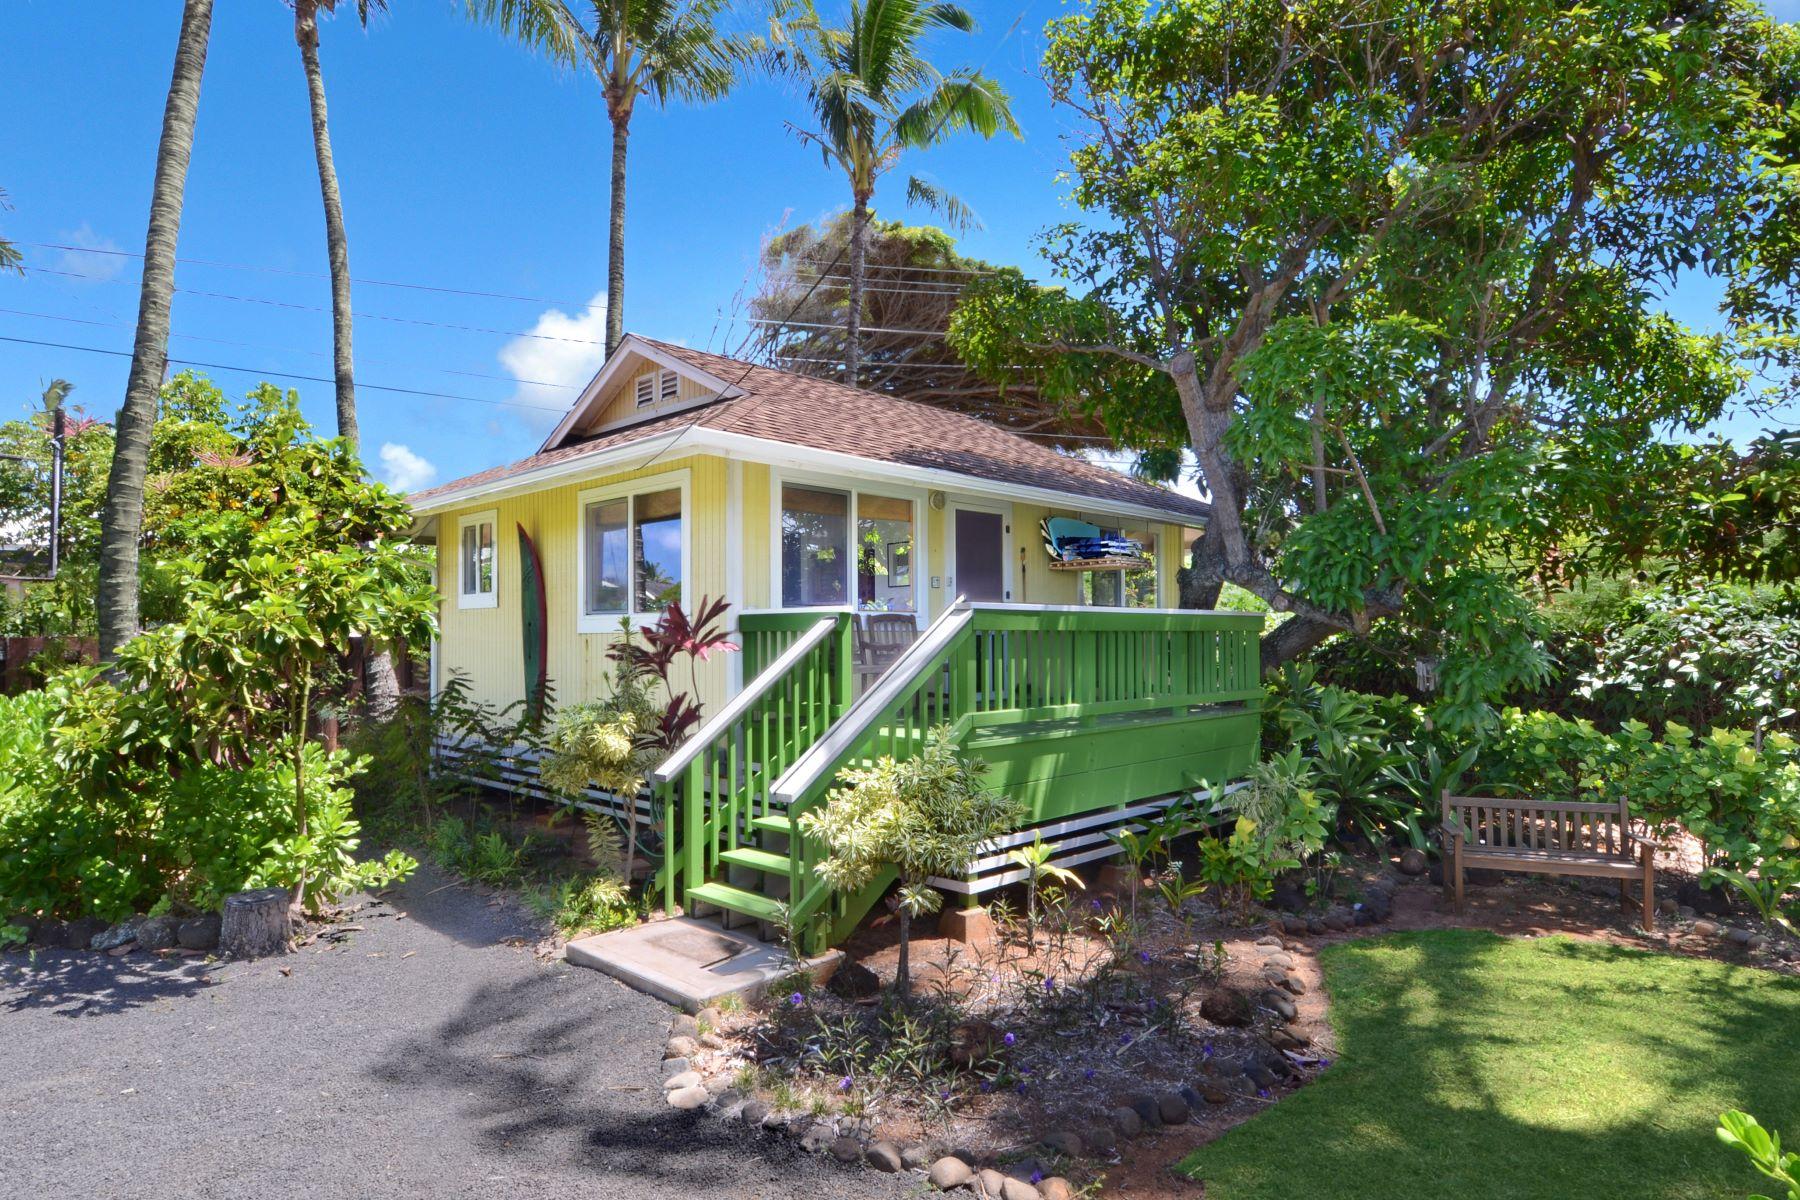 Condominiums 為 出售 在 Hale Iki Cottage: 17 Palms Kauai 414 Wailua Kai, Kapaa, 夏威夷 96746 美國